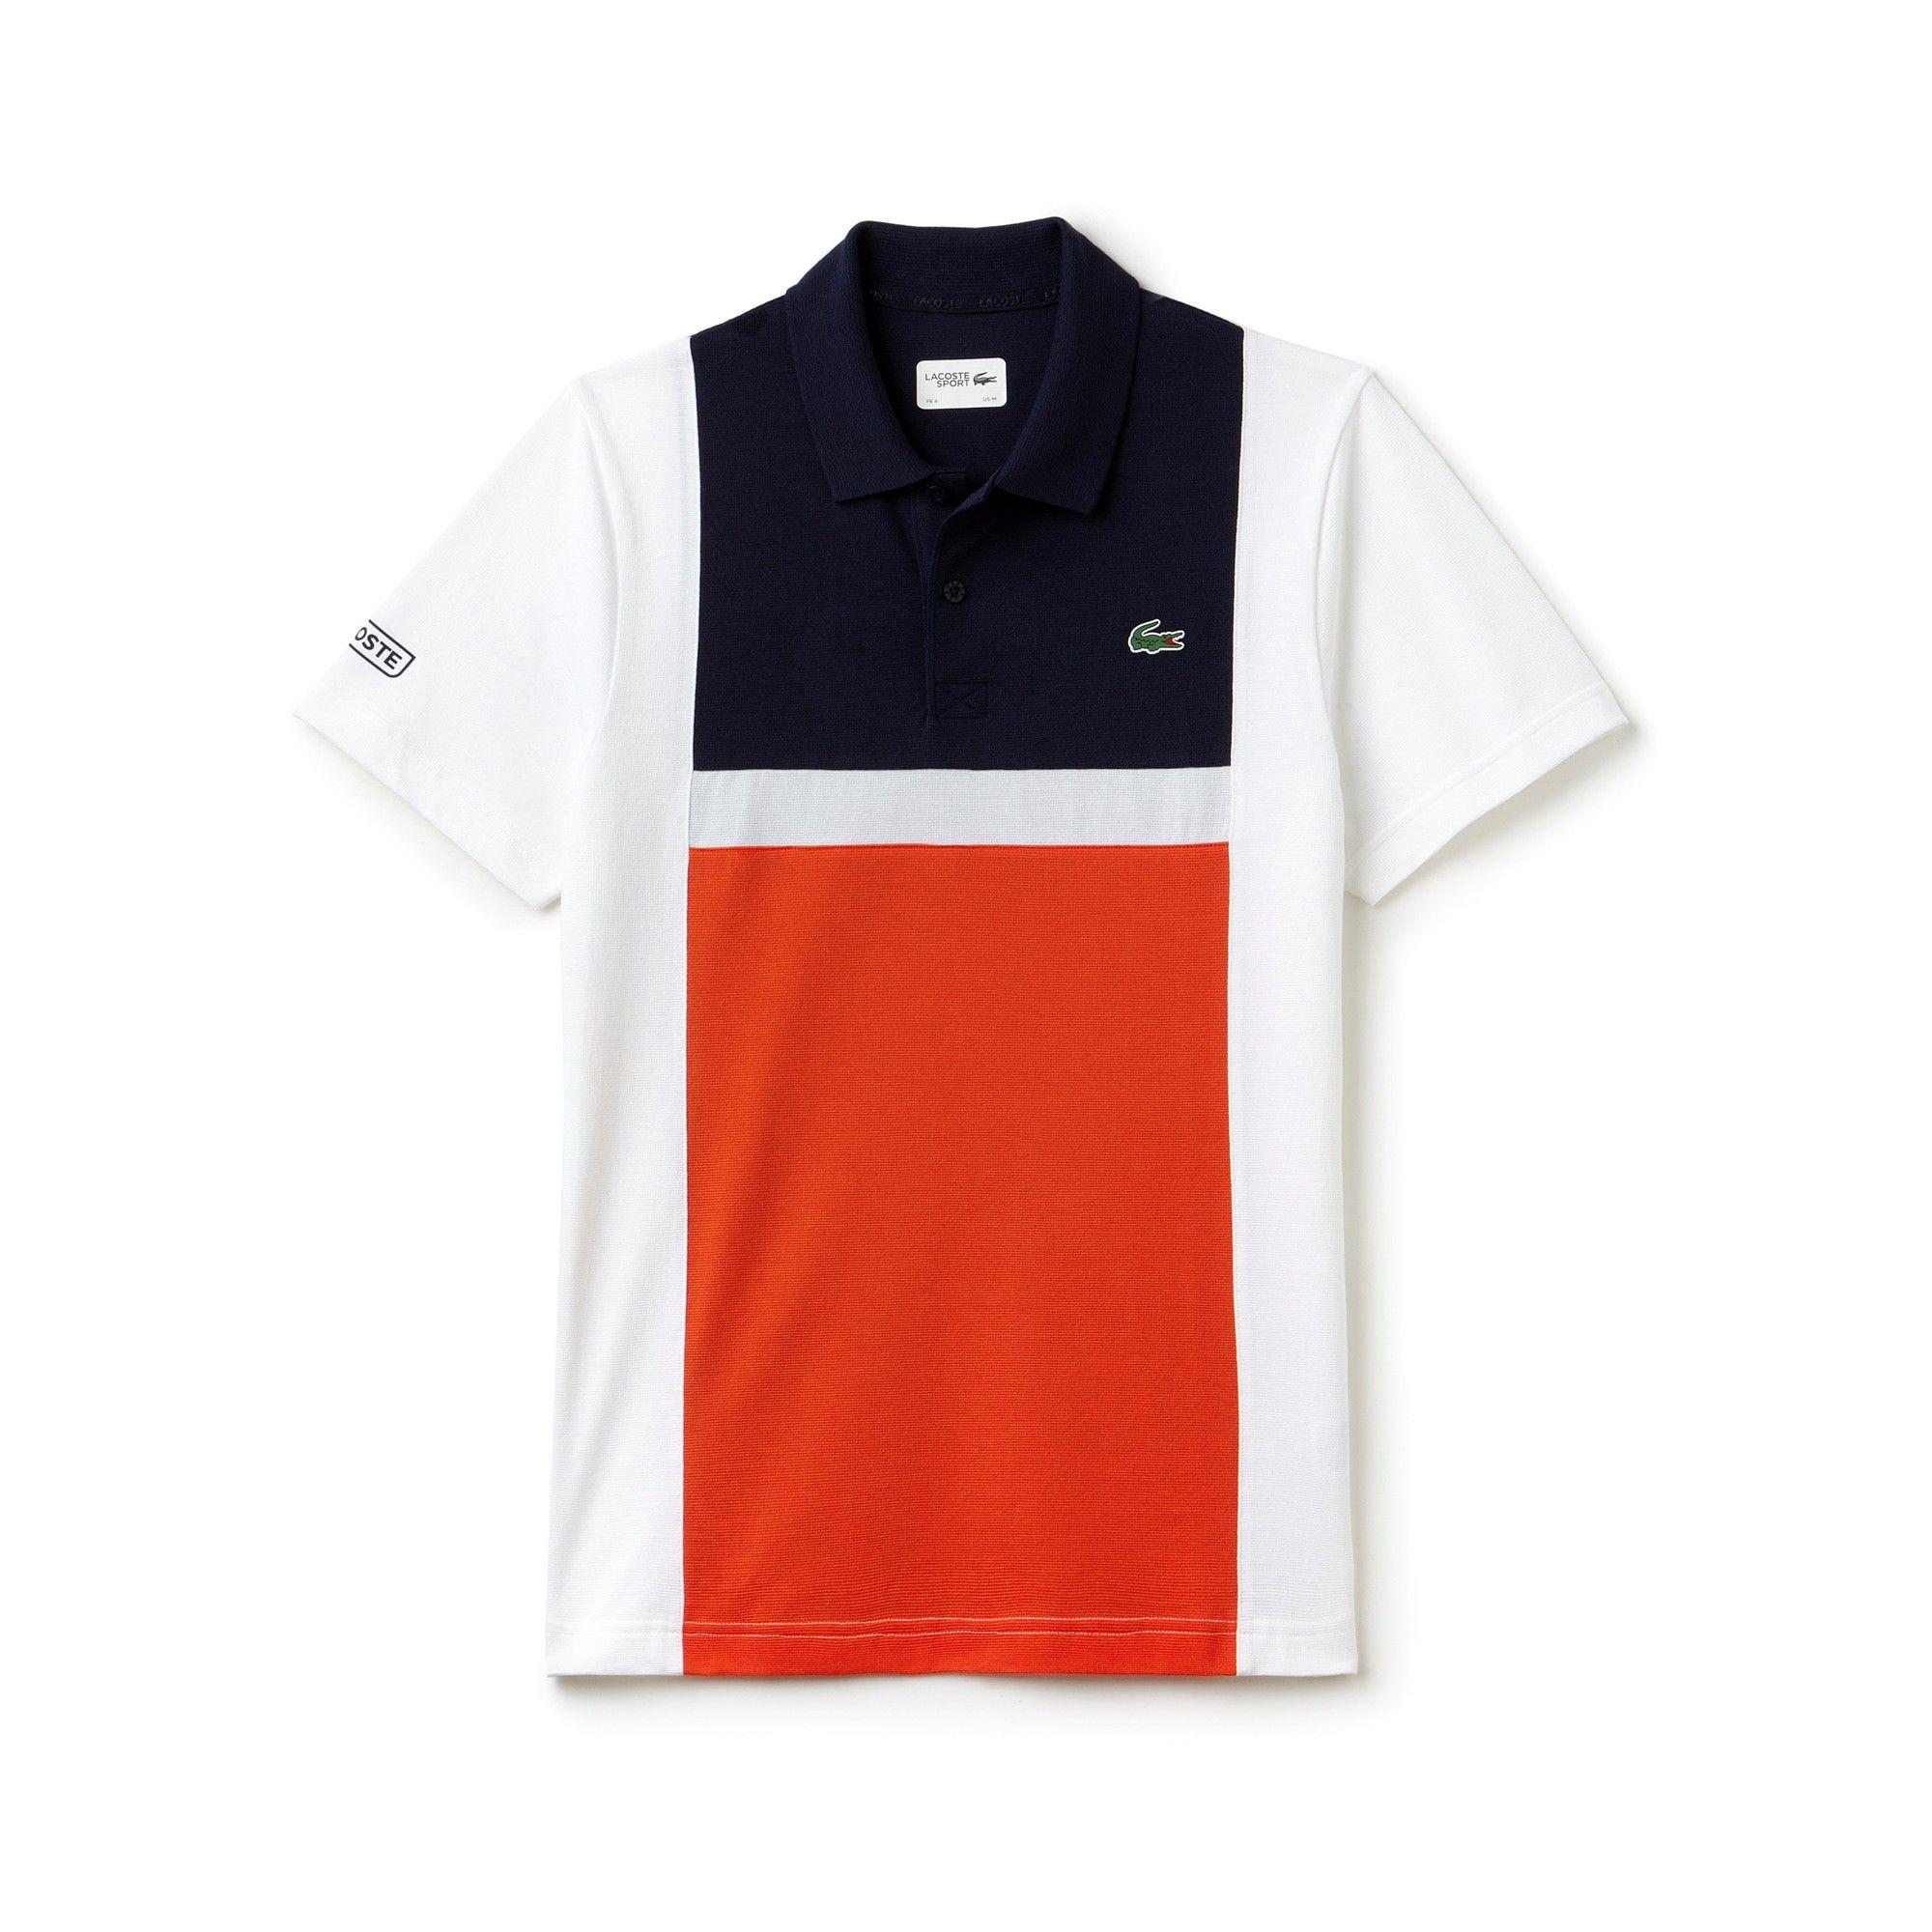 Predownload: Lacoste Men S Sport Tennis Colorblock Ultra Light Cotton Polo White Navy Blue Mexico Re Xxl Polo Shirt Design Tee Shirt Fashion Mens Designer Shirts [ 2000 x 2000 Pixel ]